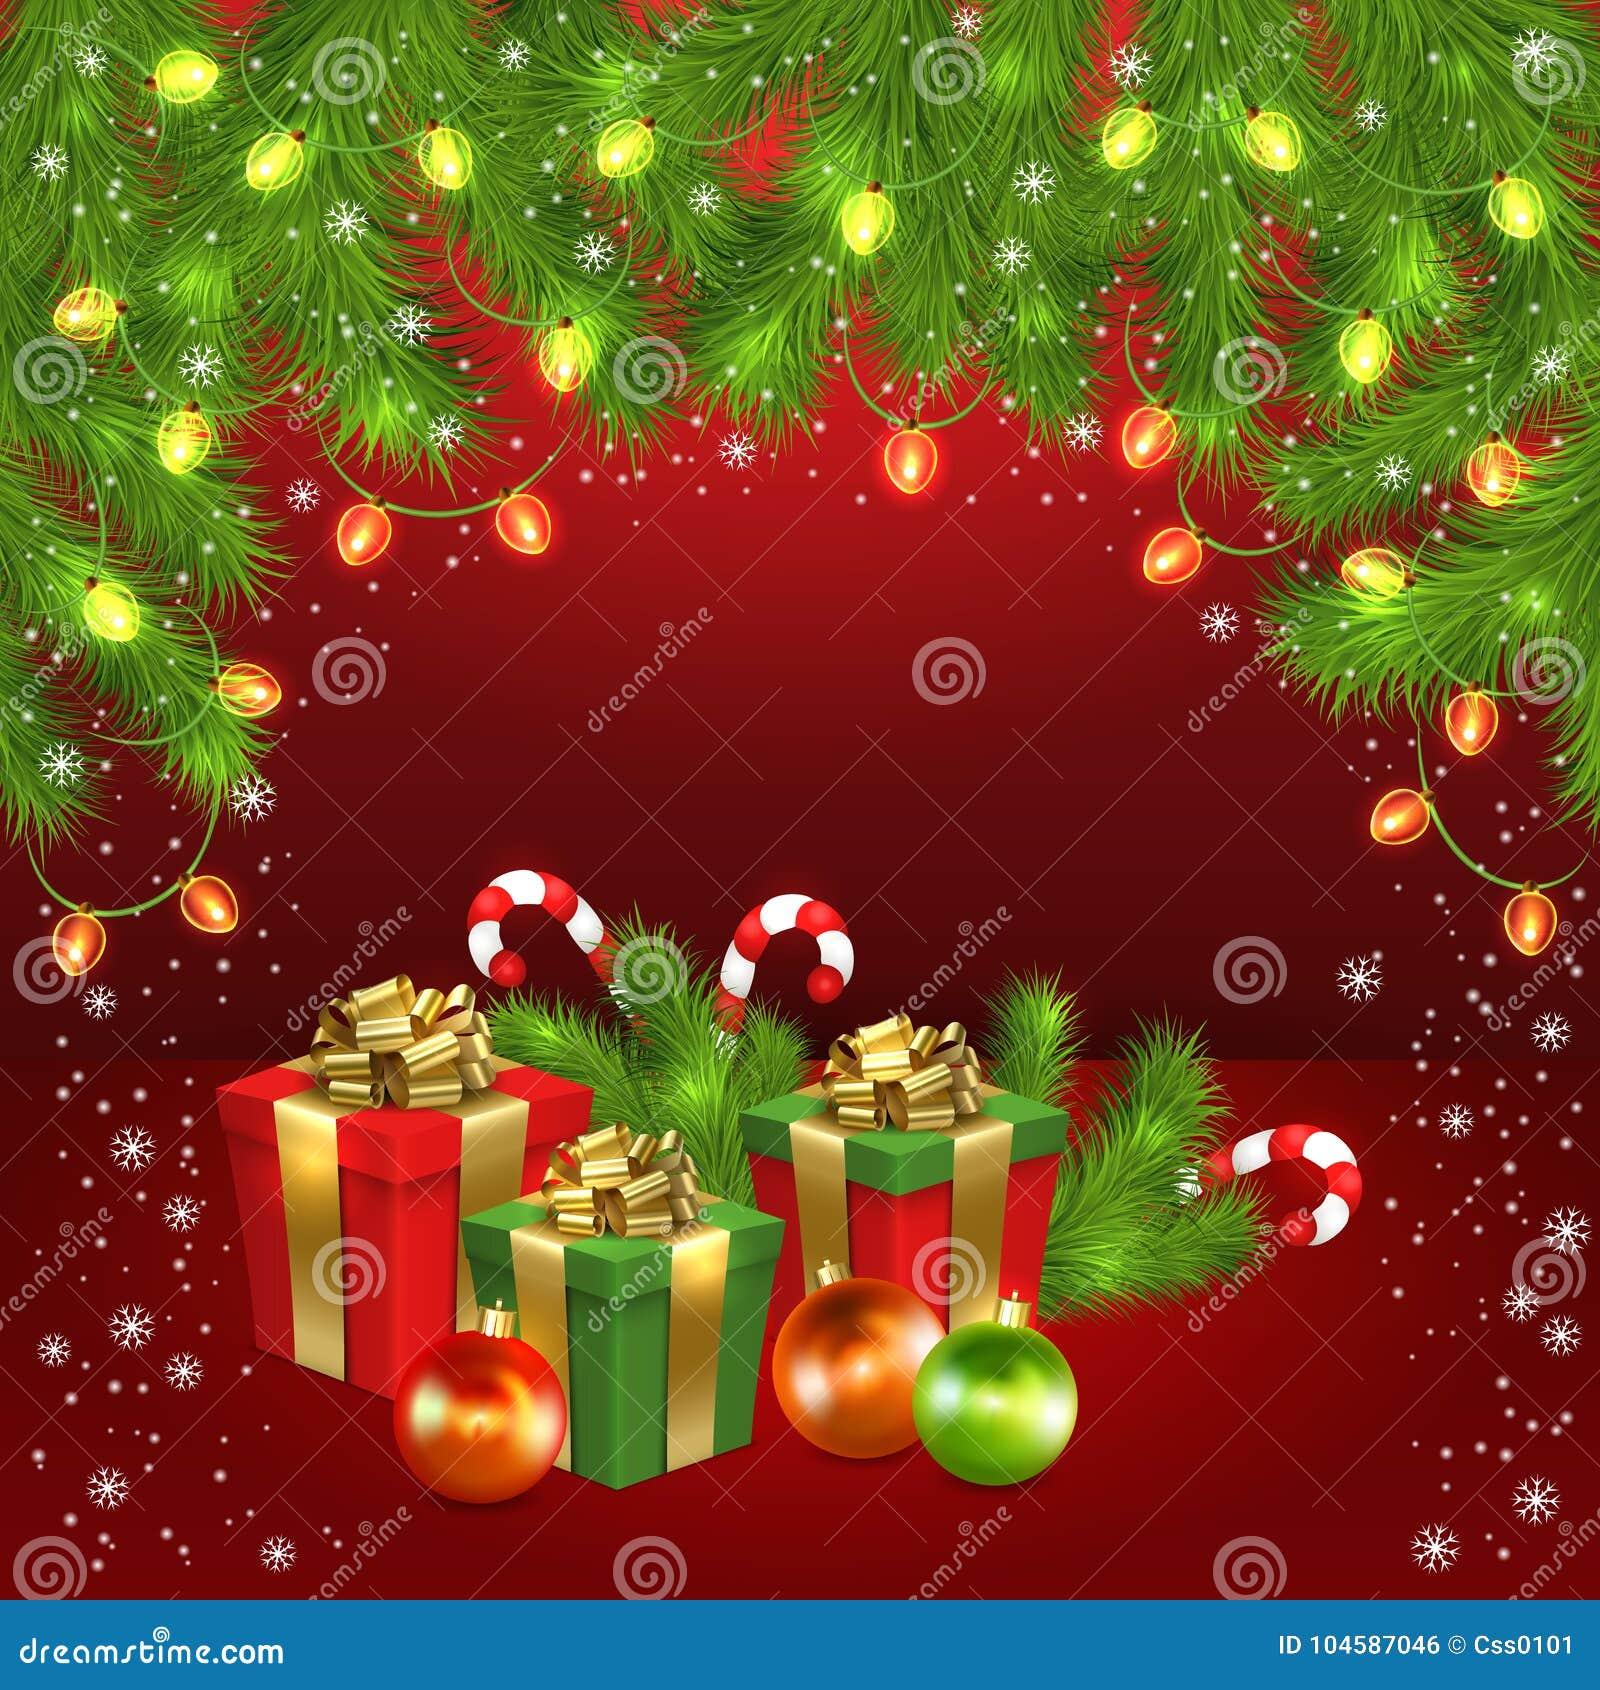 Christmas Gift Box Ball Candy Garland Fir Tree Stock Vector